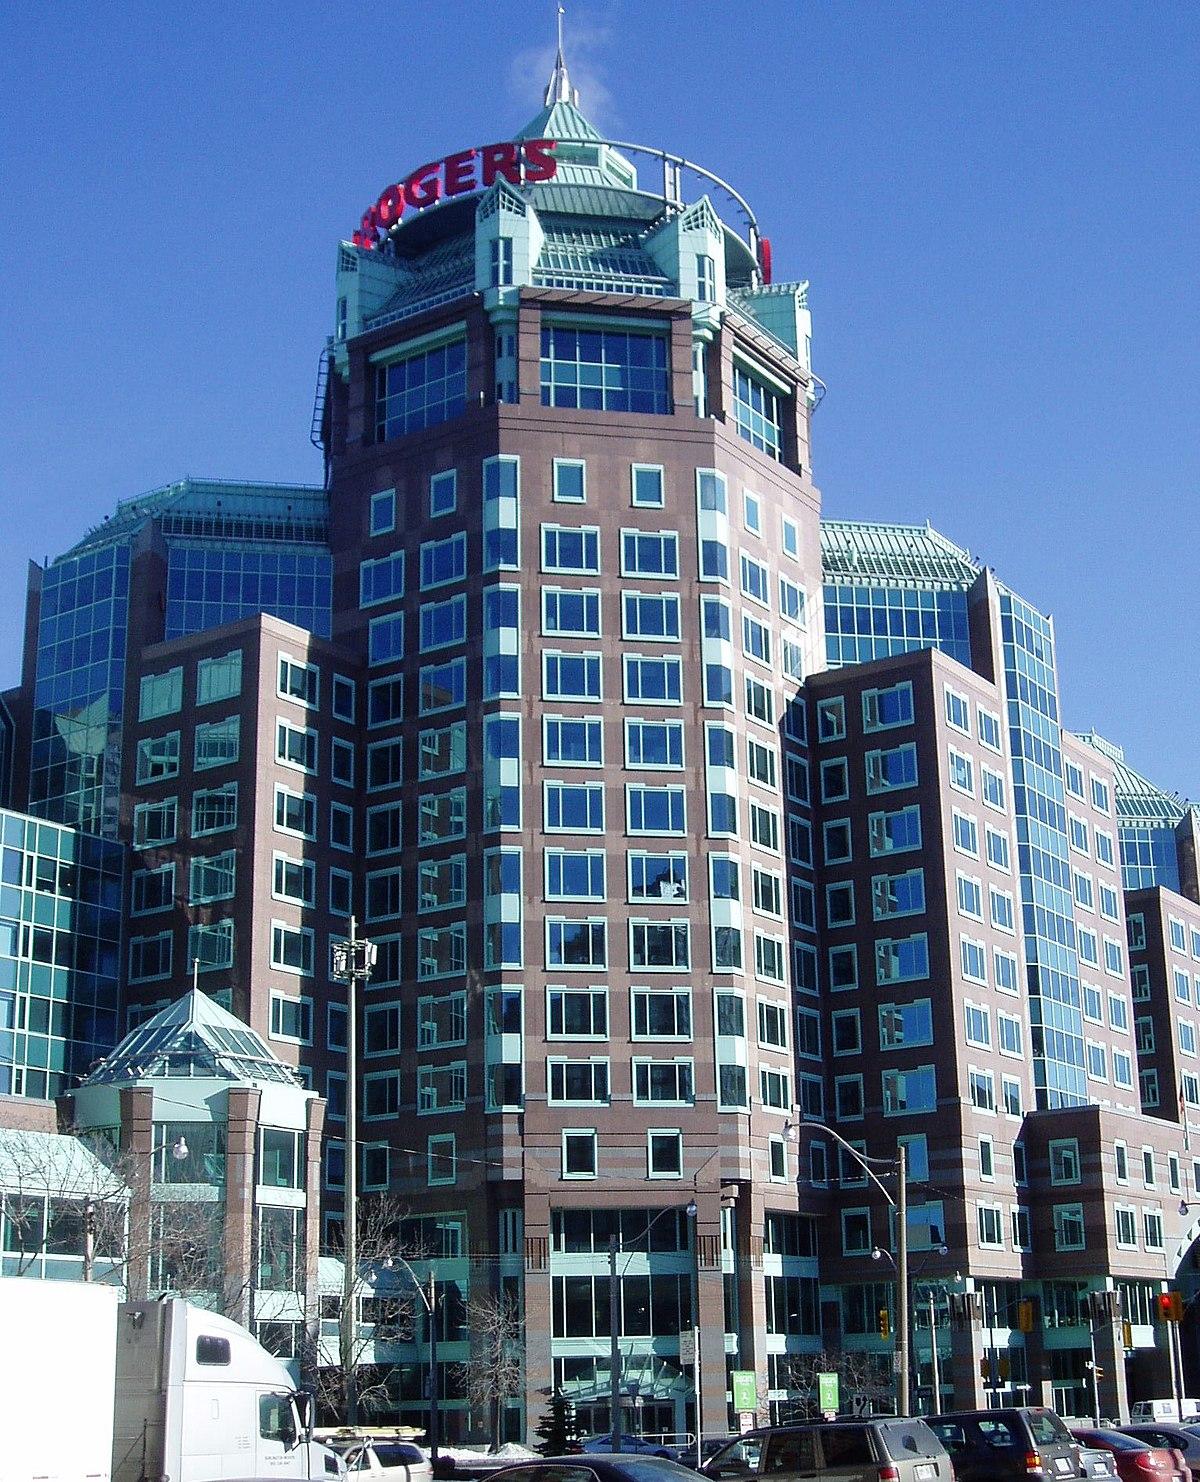 Rogers Communications - Wikipedia